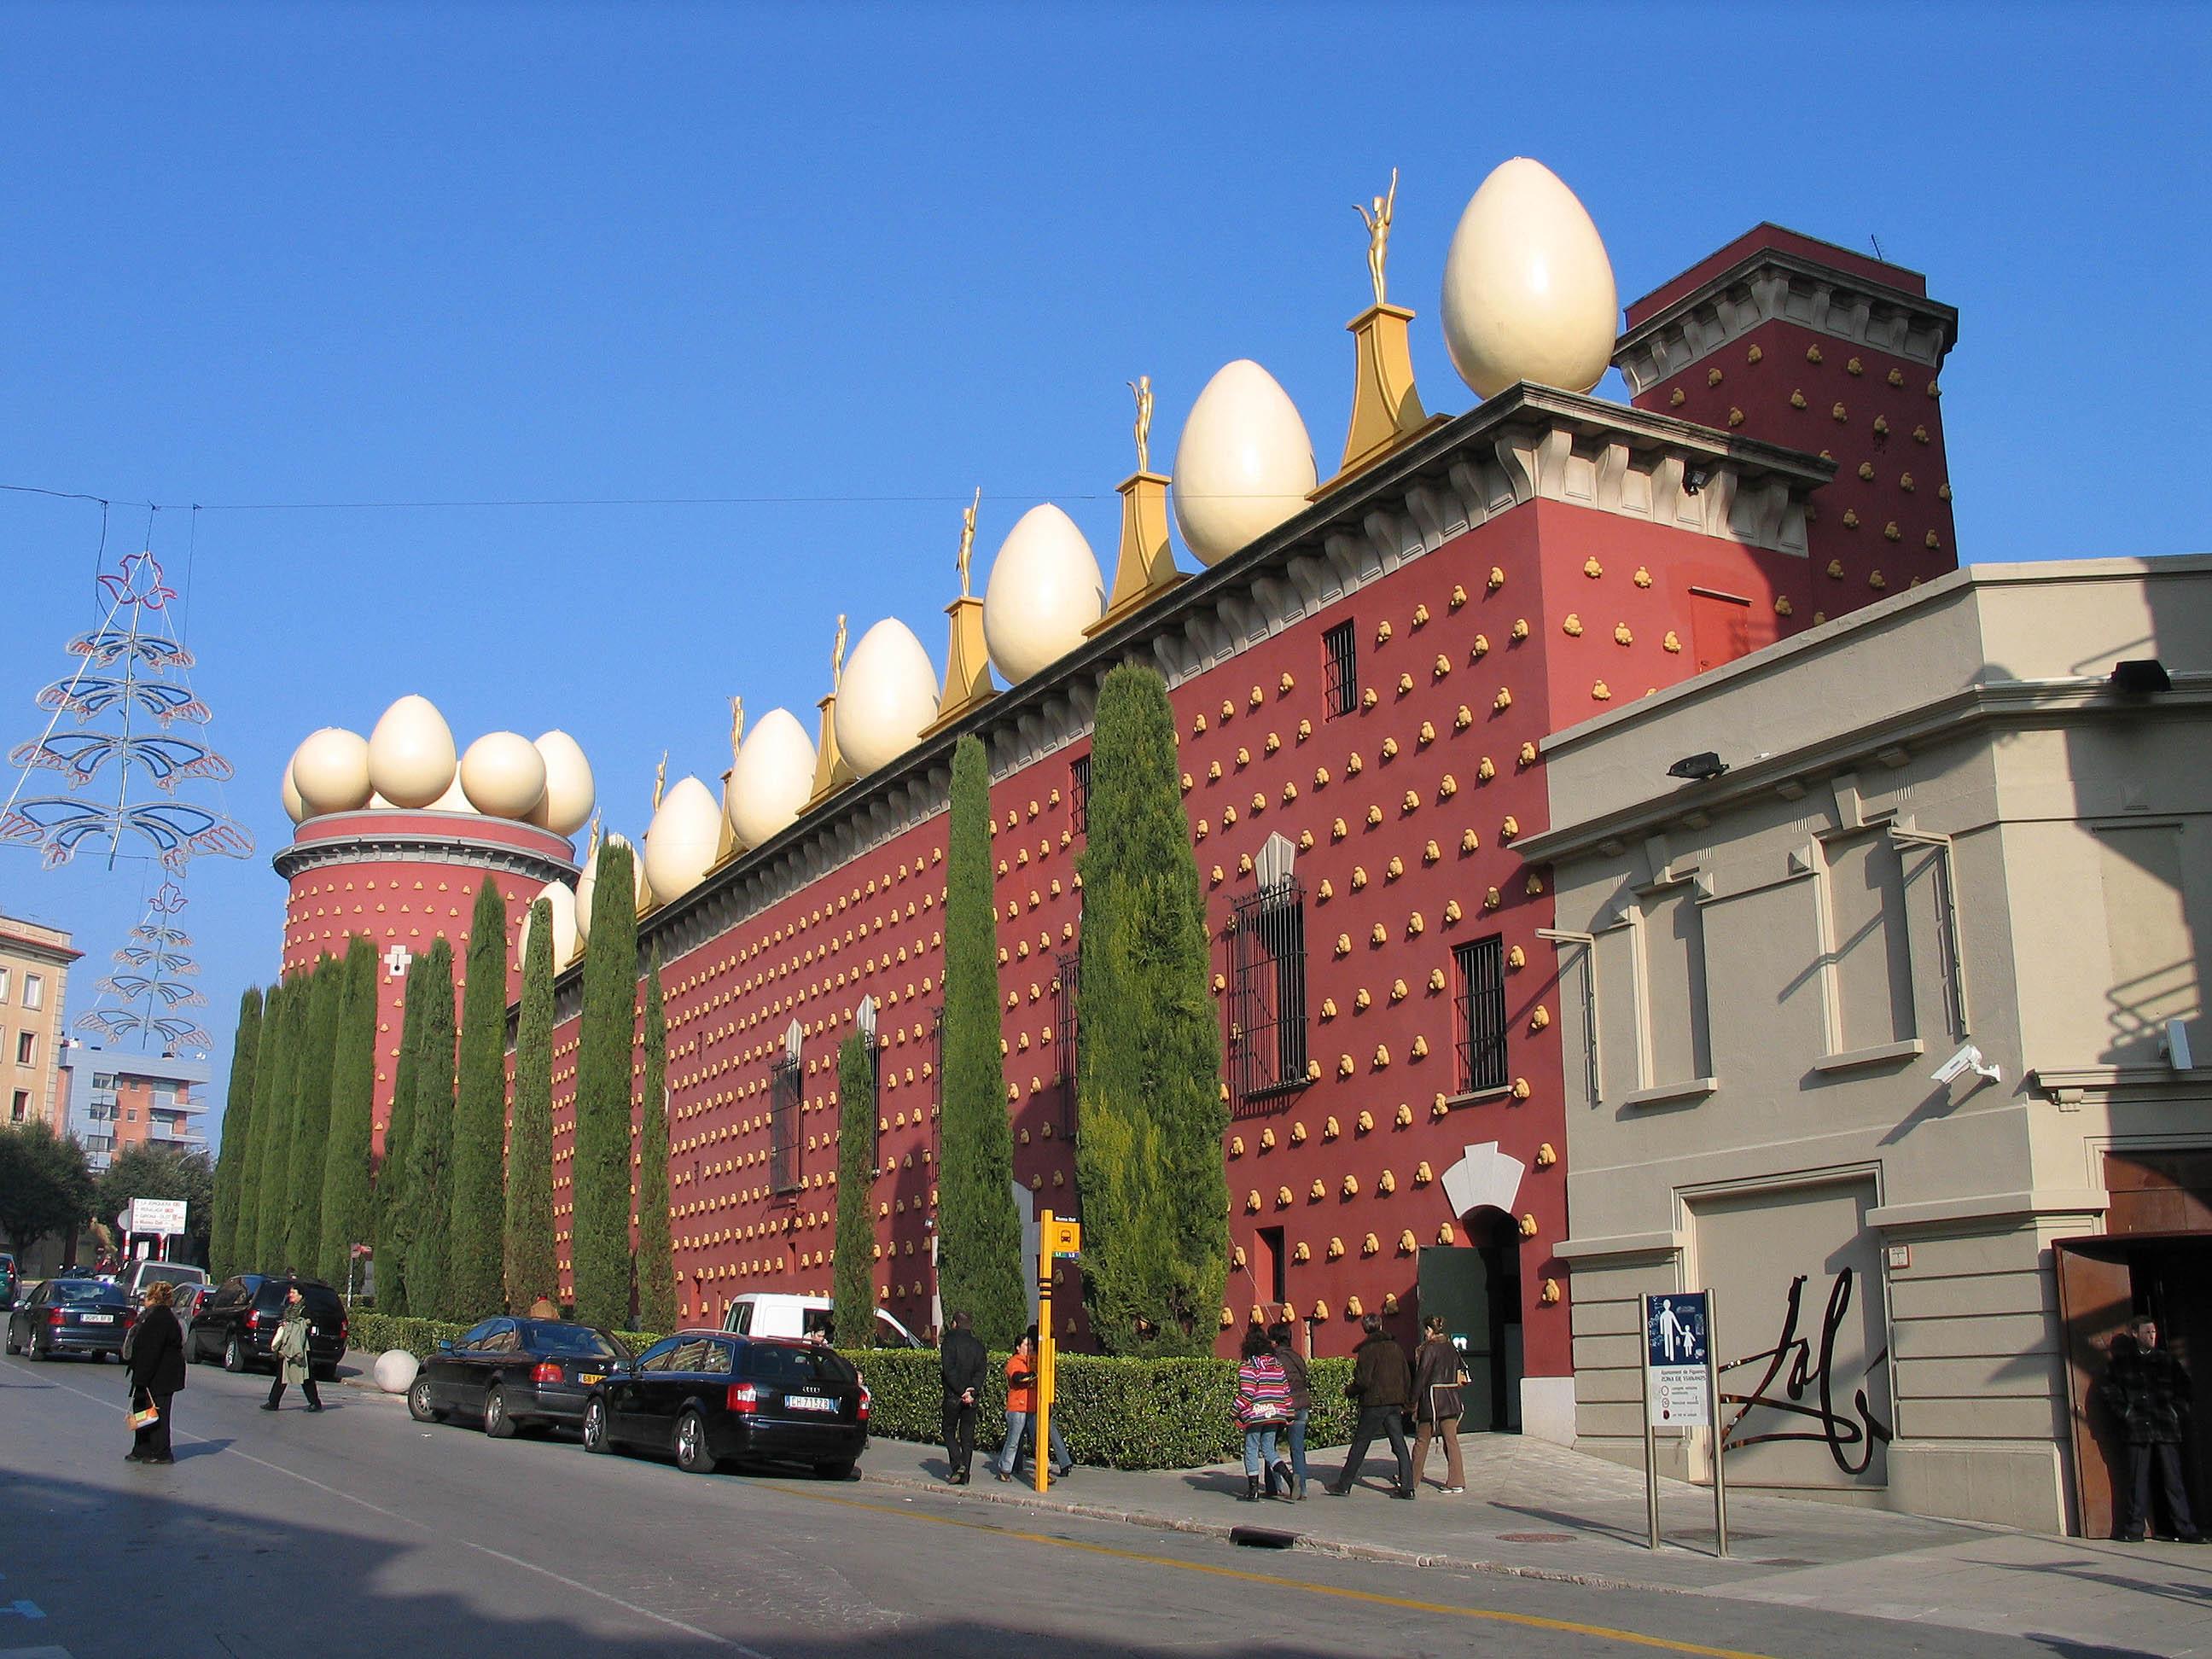 Teatro-Museo Dalí en Figueres (Wikipedia).